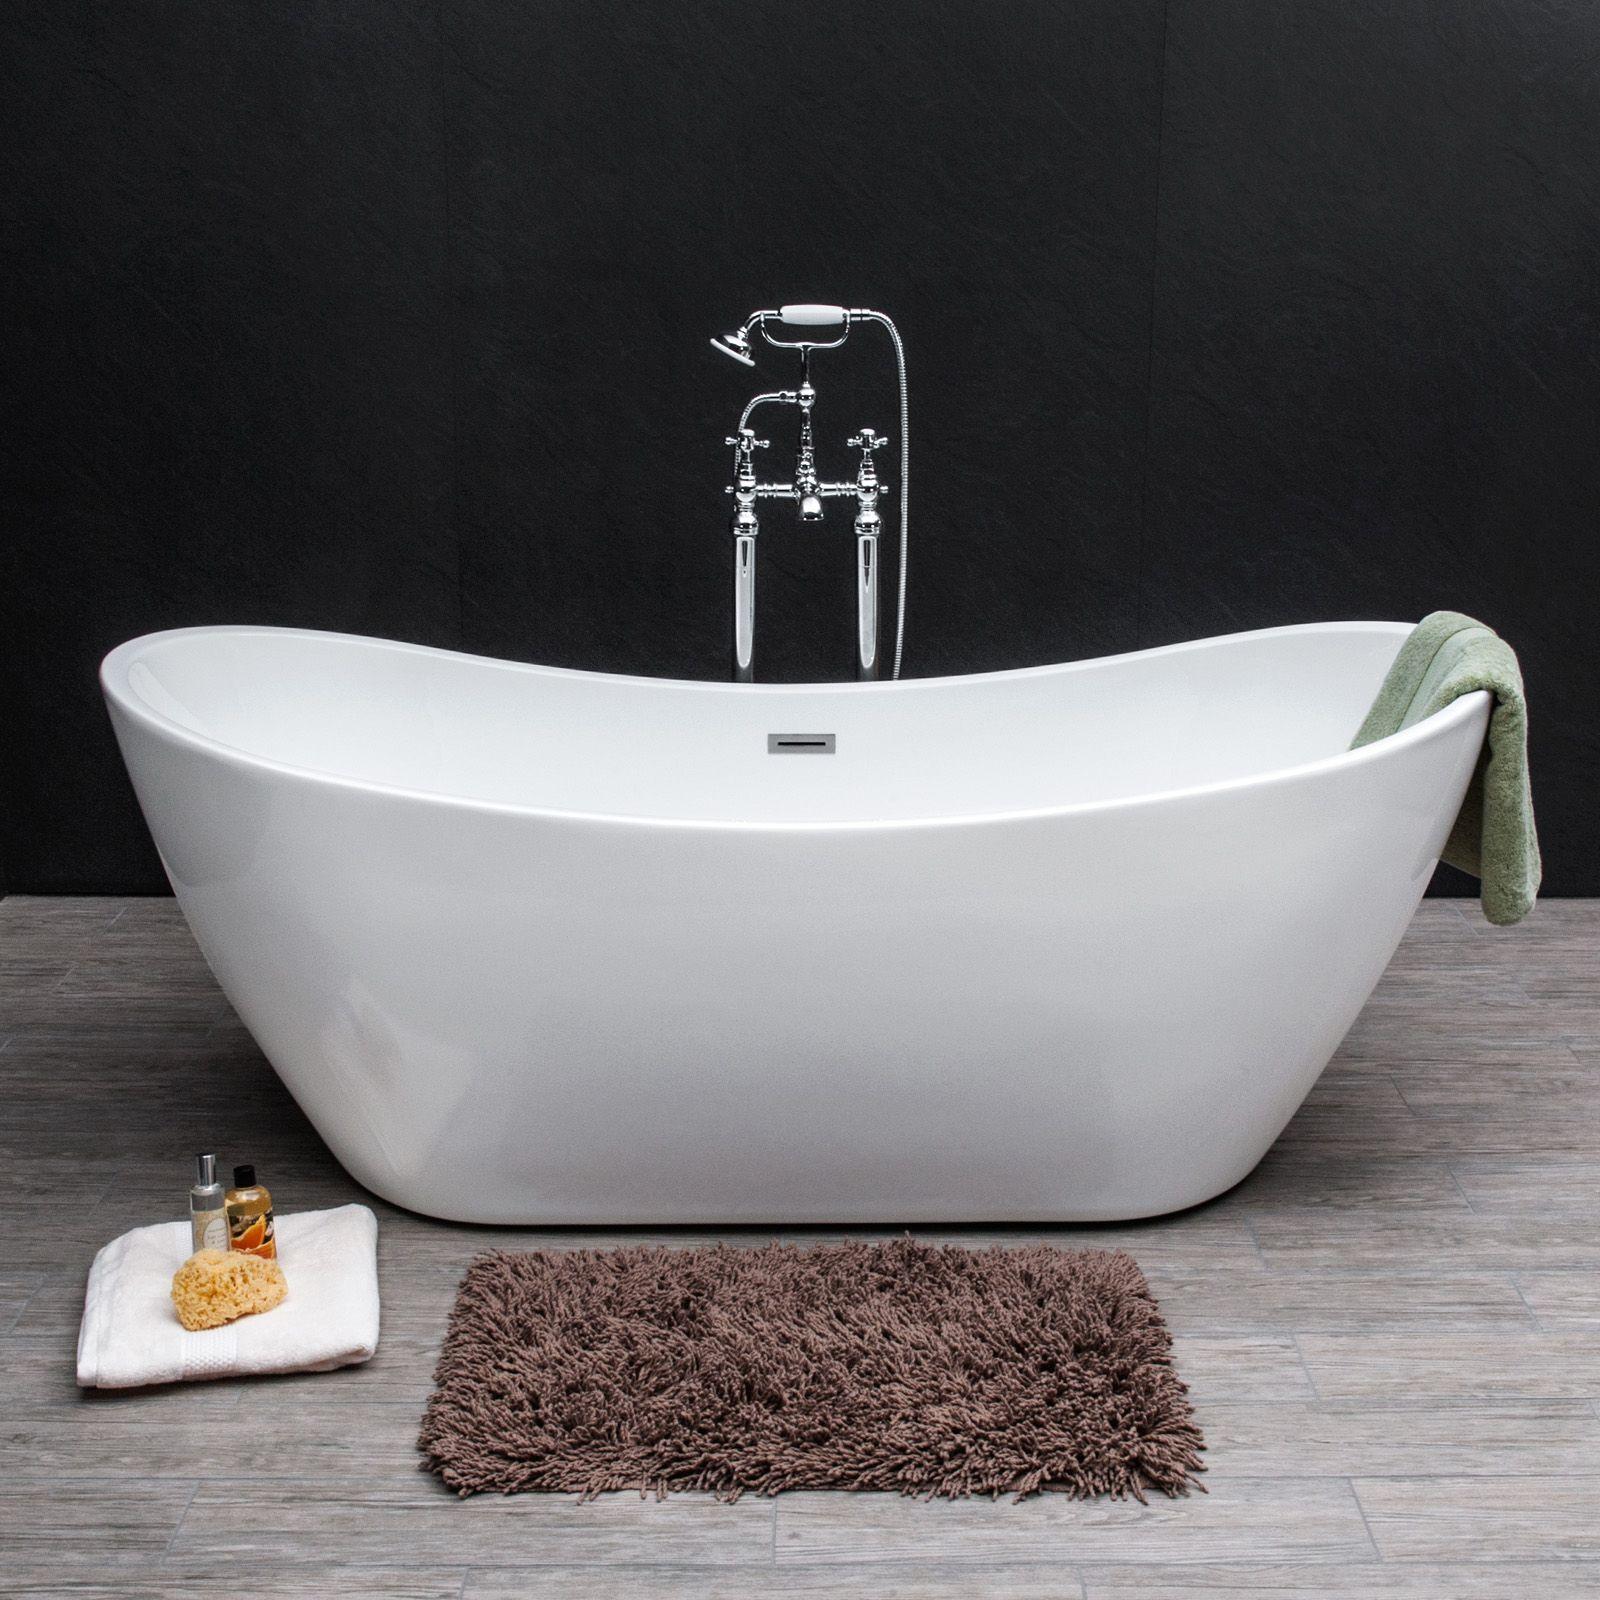 Savisto Monza Roll Top Freestanding Double Ended Slipper Bath Tub ...